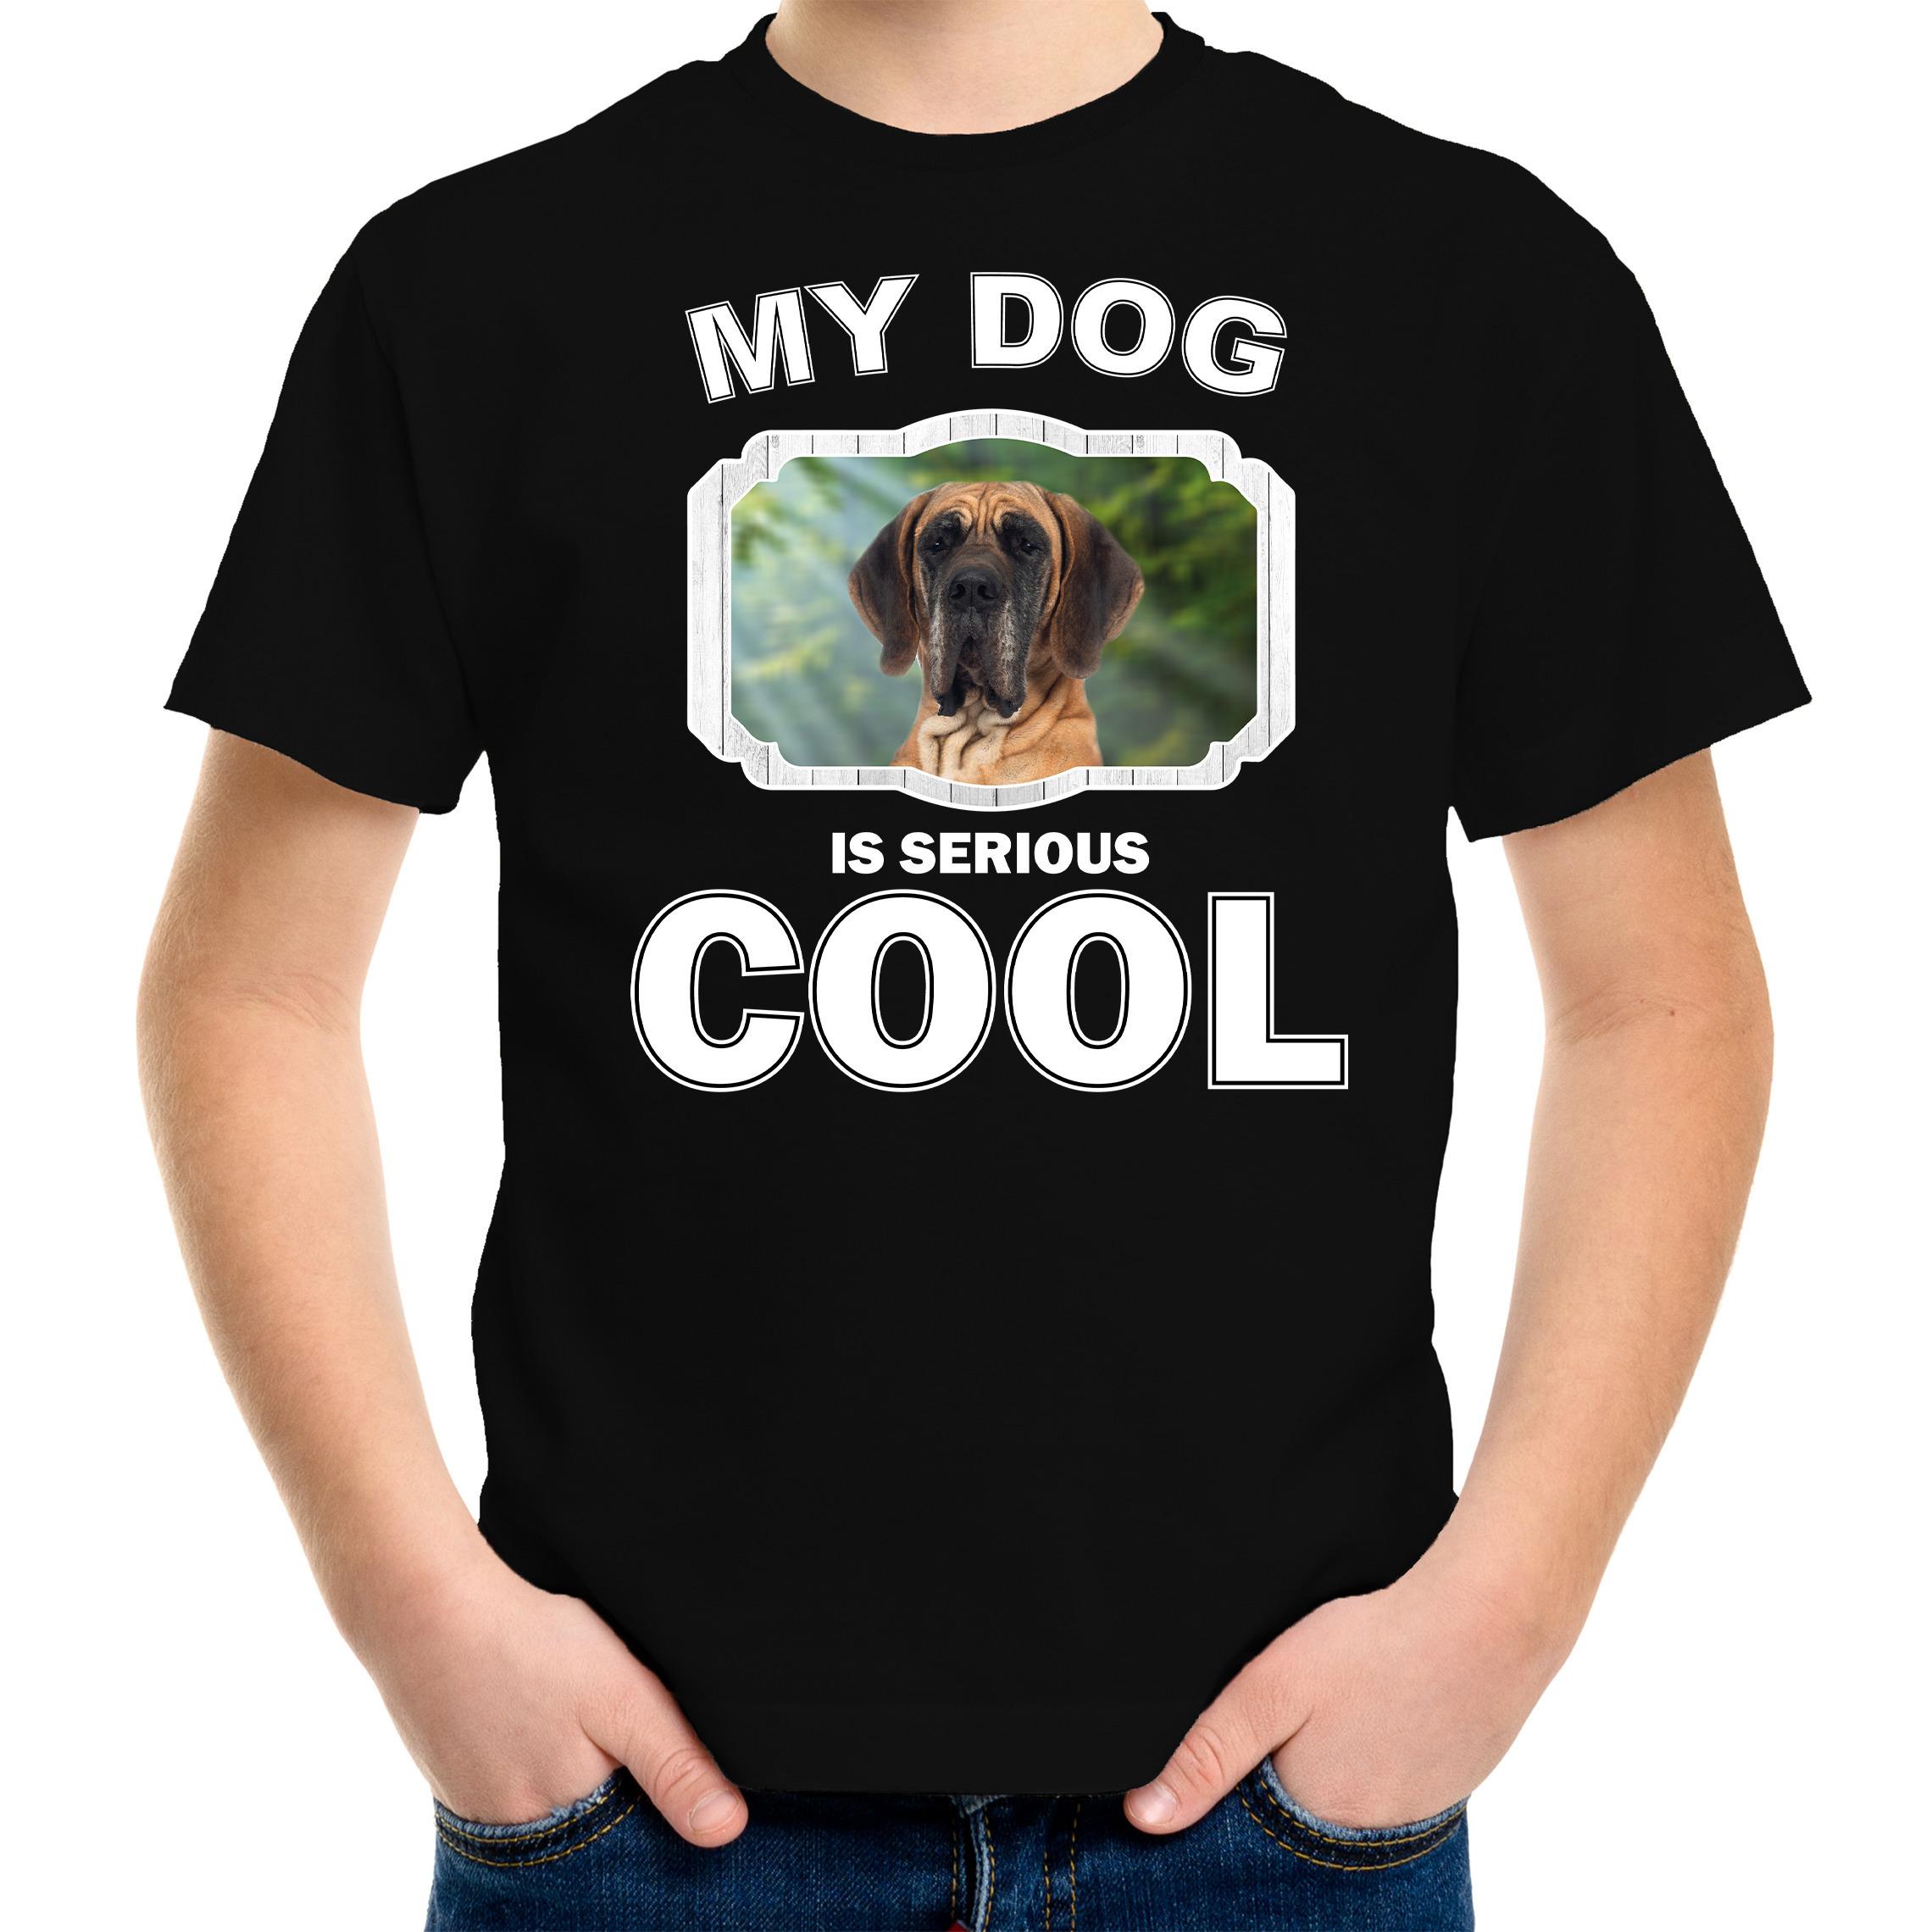 Honden liefhebber shirt Deense dog my dog is serious cool zwart voor kinderen